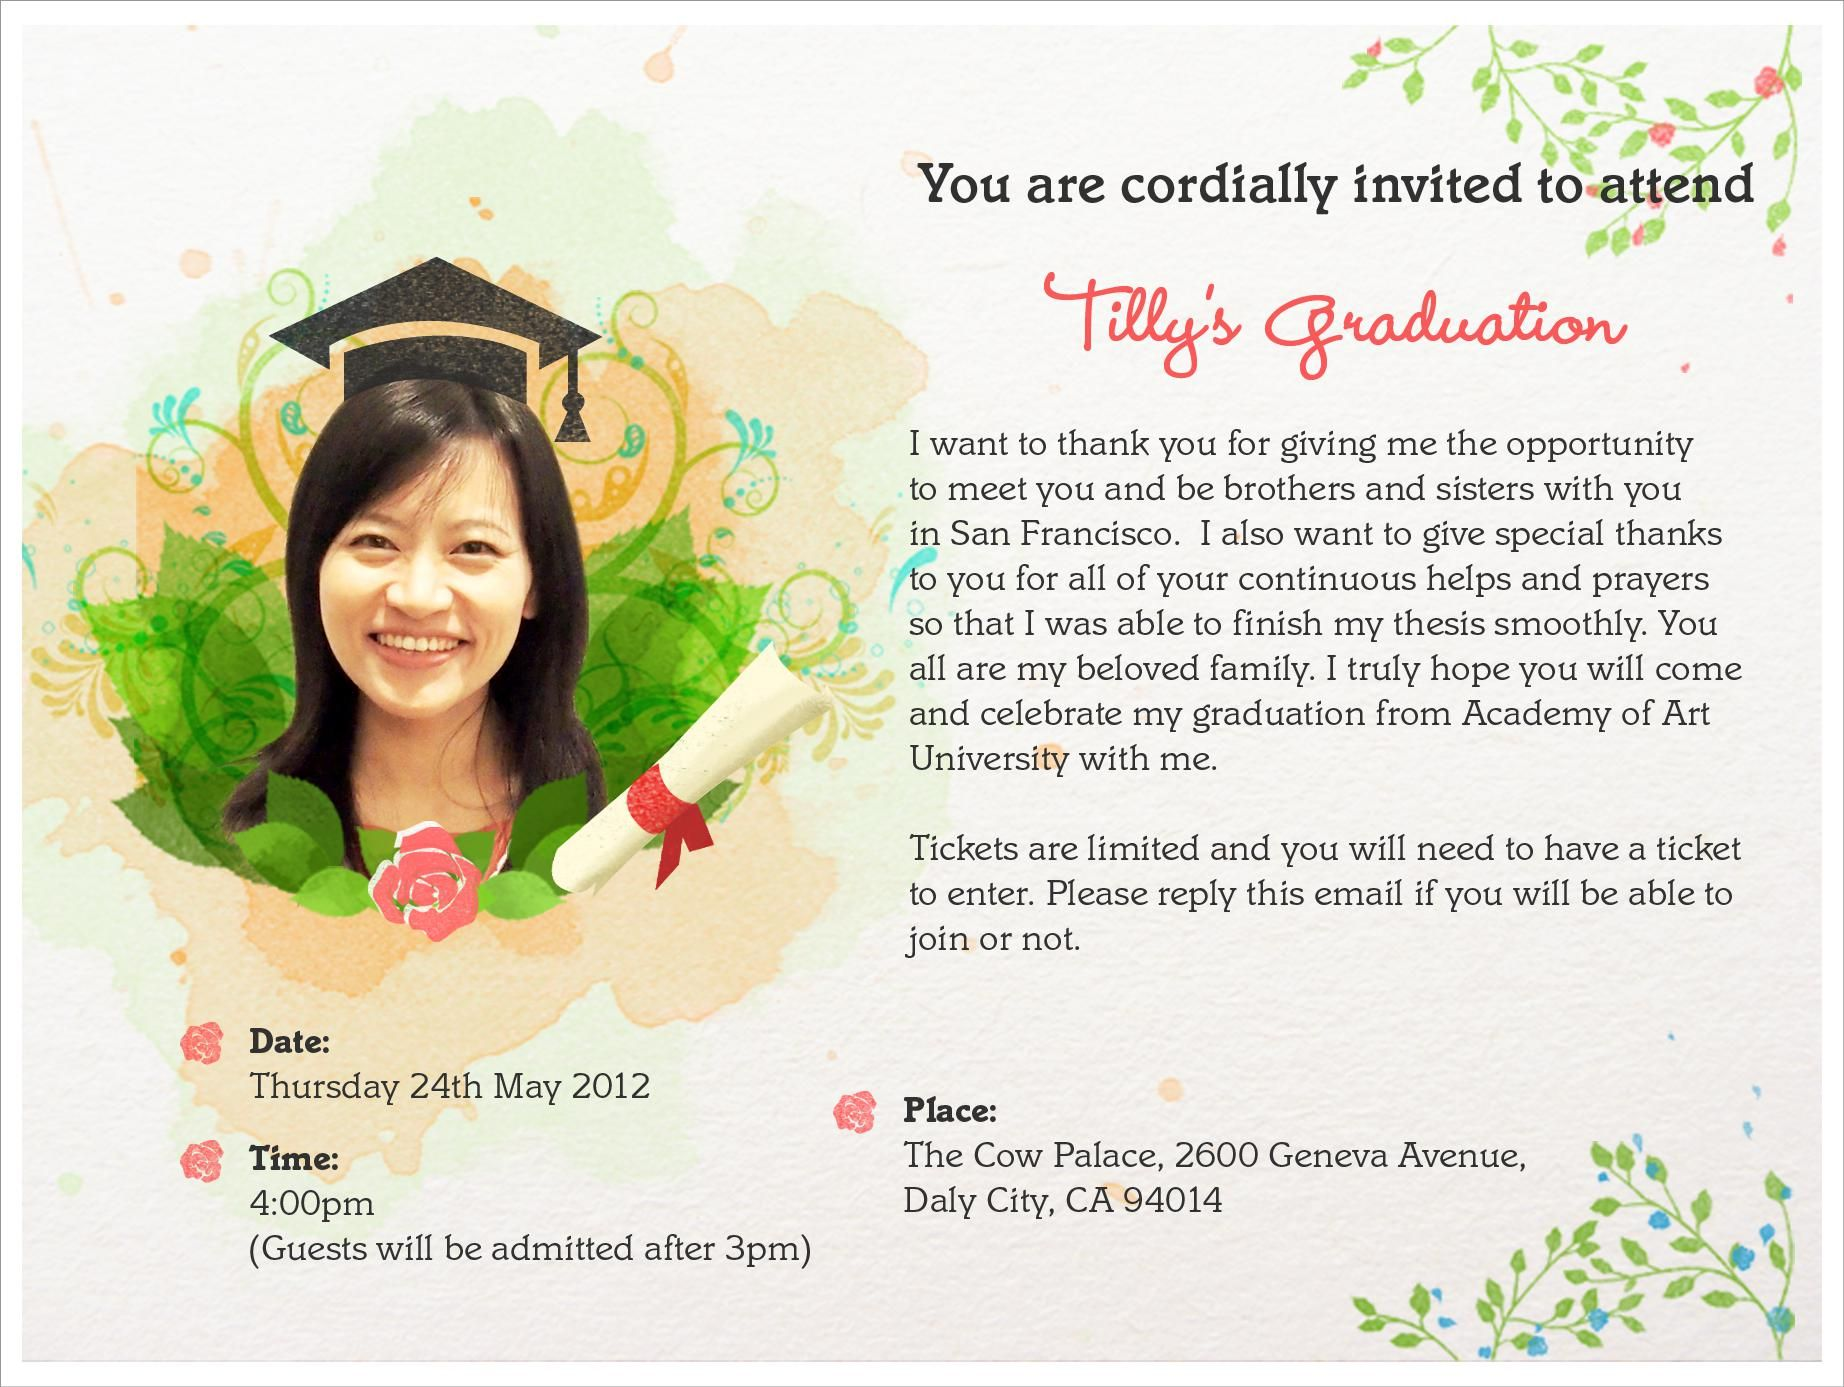 Graduation Invitation Cards Graduation Invitation Card Design